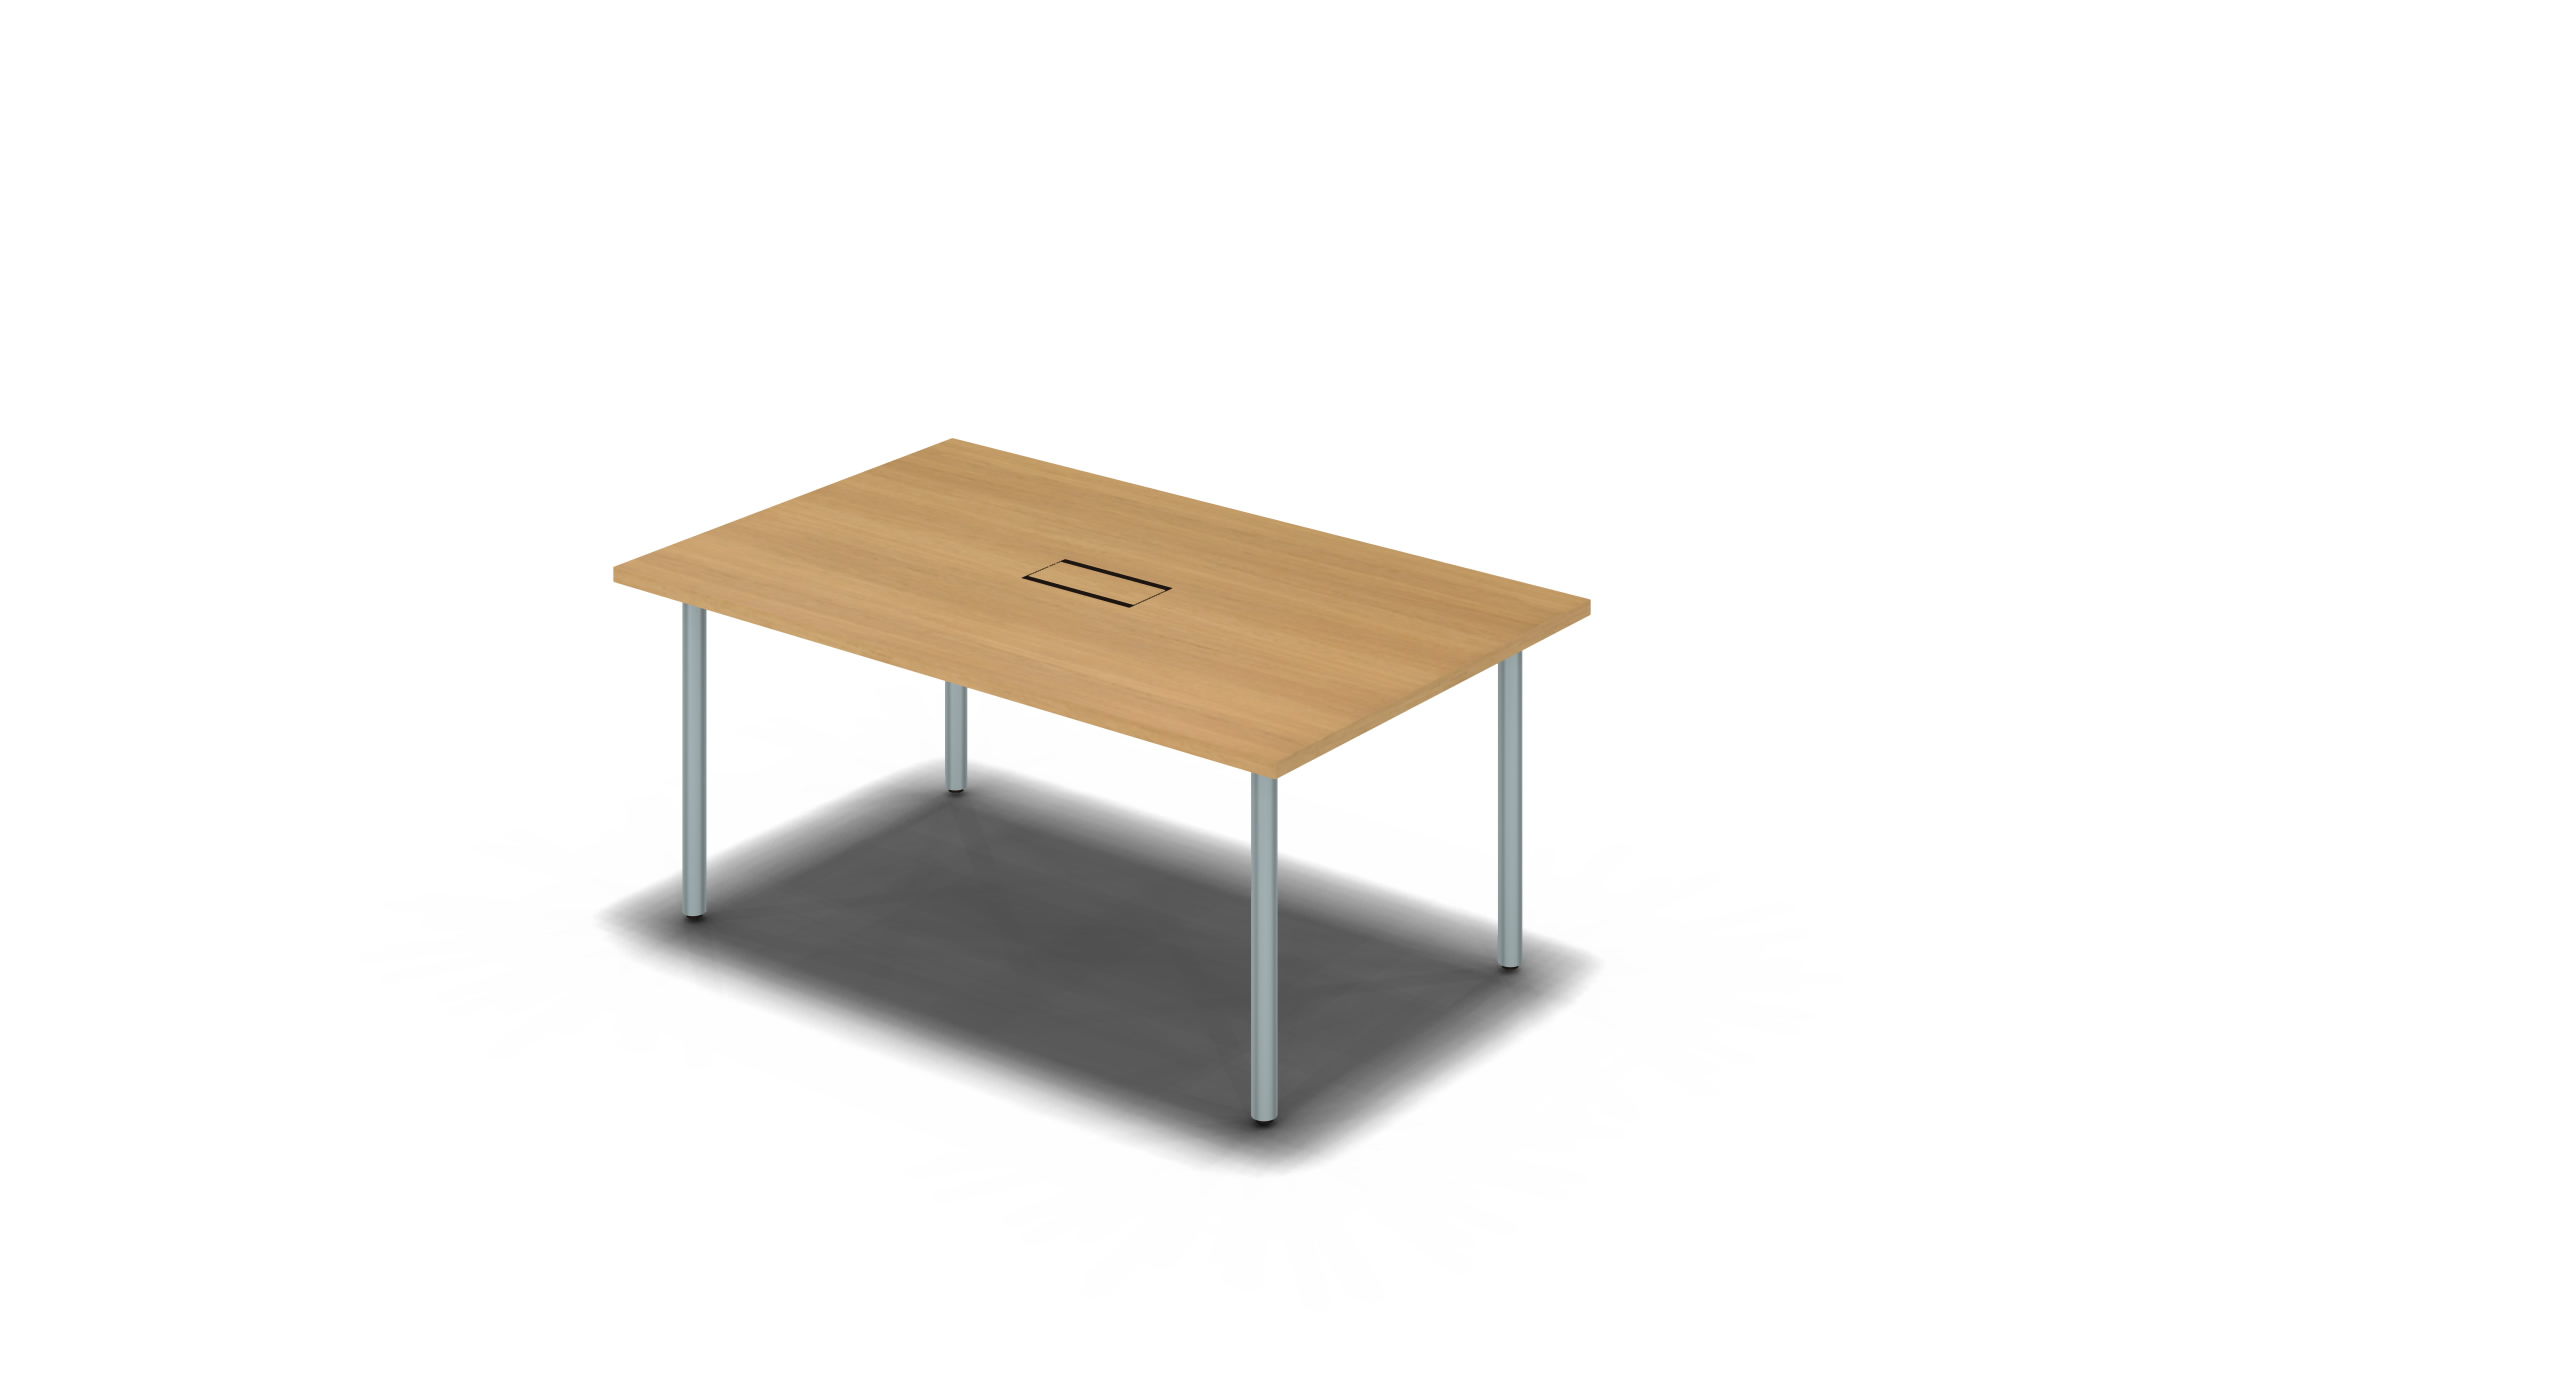 Table_Round_1500x900_Silver_Oak_withOption